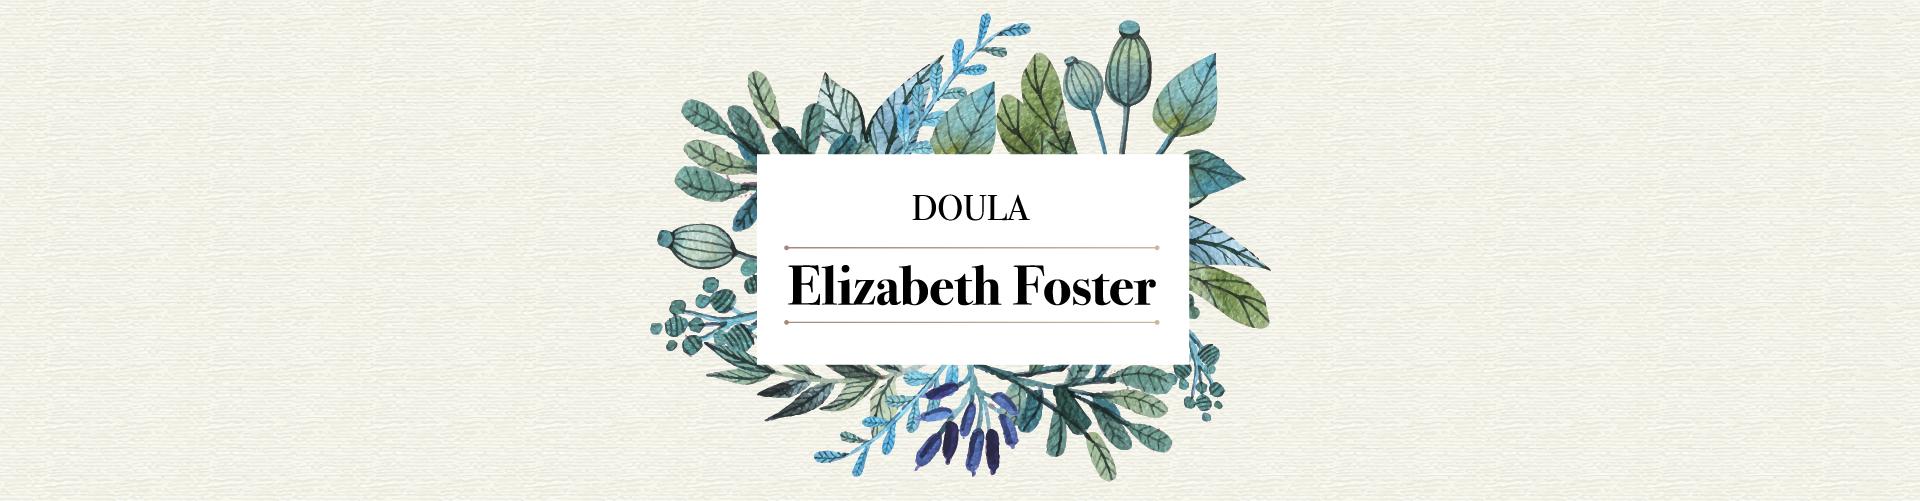 Doula Elizabeth Foster